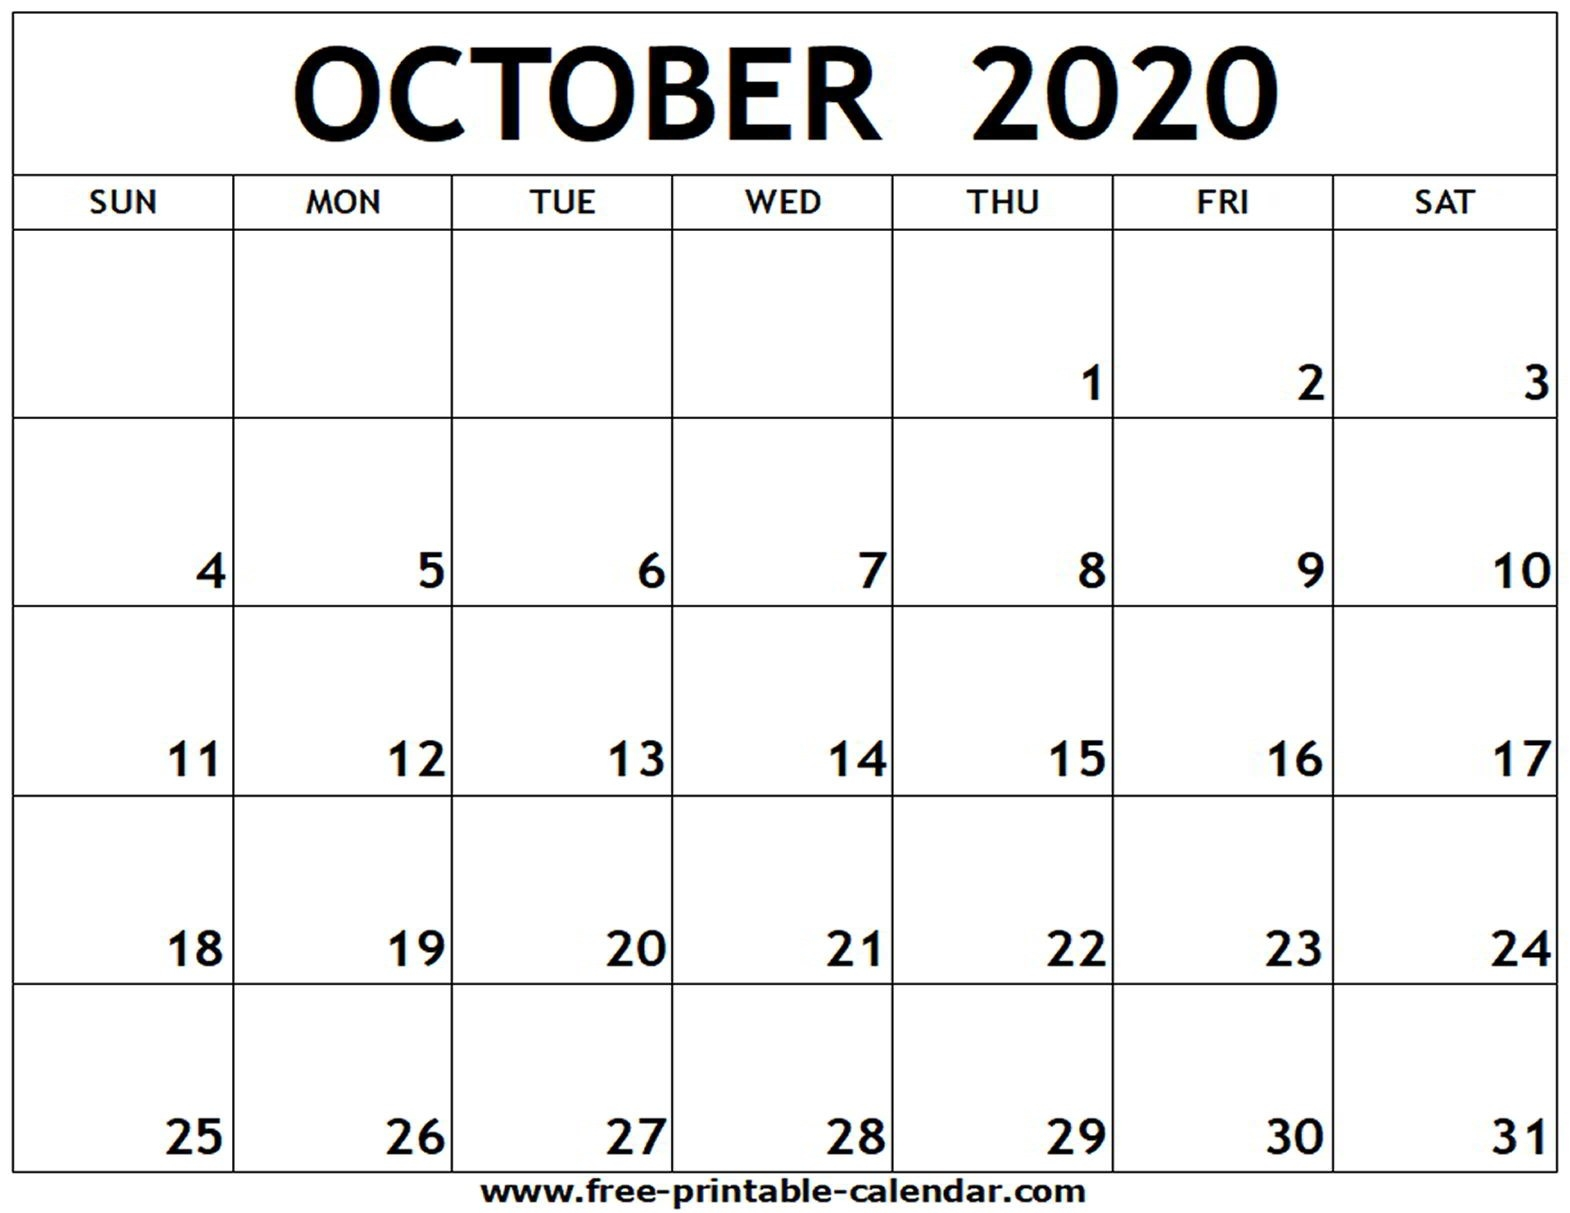 October 2020 Printable Calendar - Free-Printable-Calendar-October 2020 Monthly Calendar Blank Printable